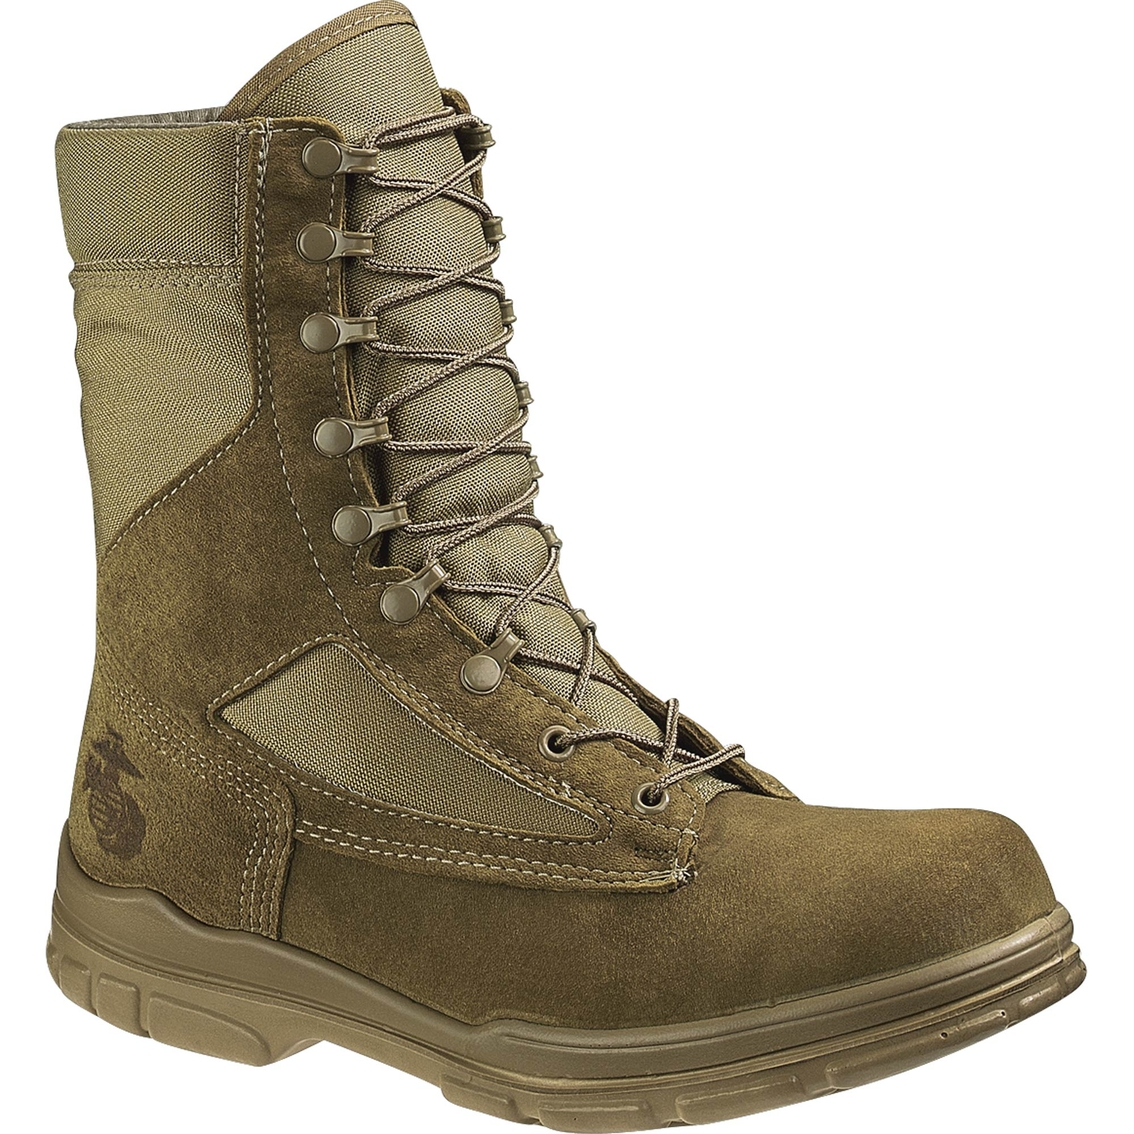 6d39e83e7c8 Bates Lites Men's Usmc Boots | Marine Corps Footwear | Military ...